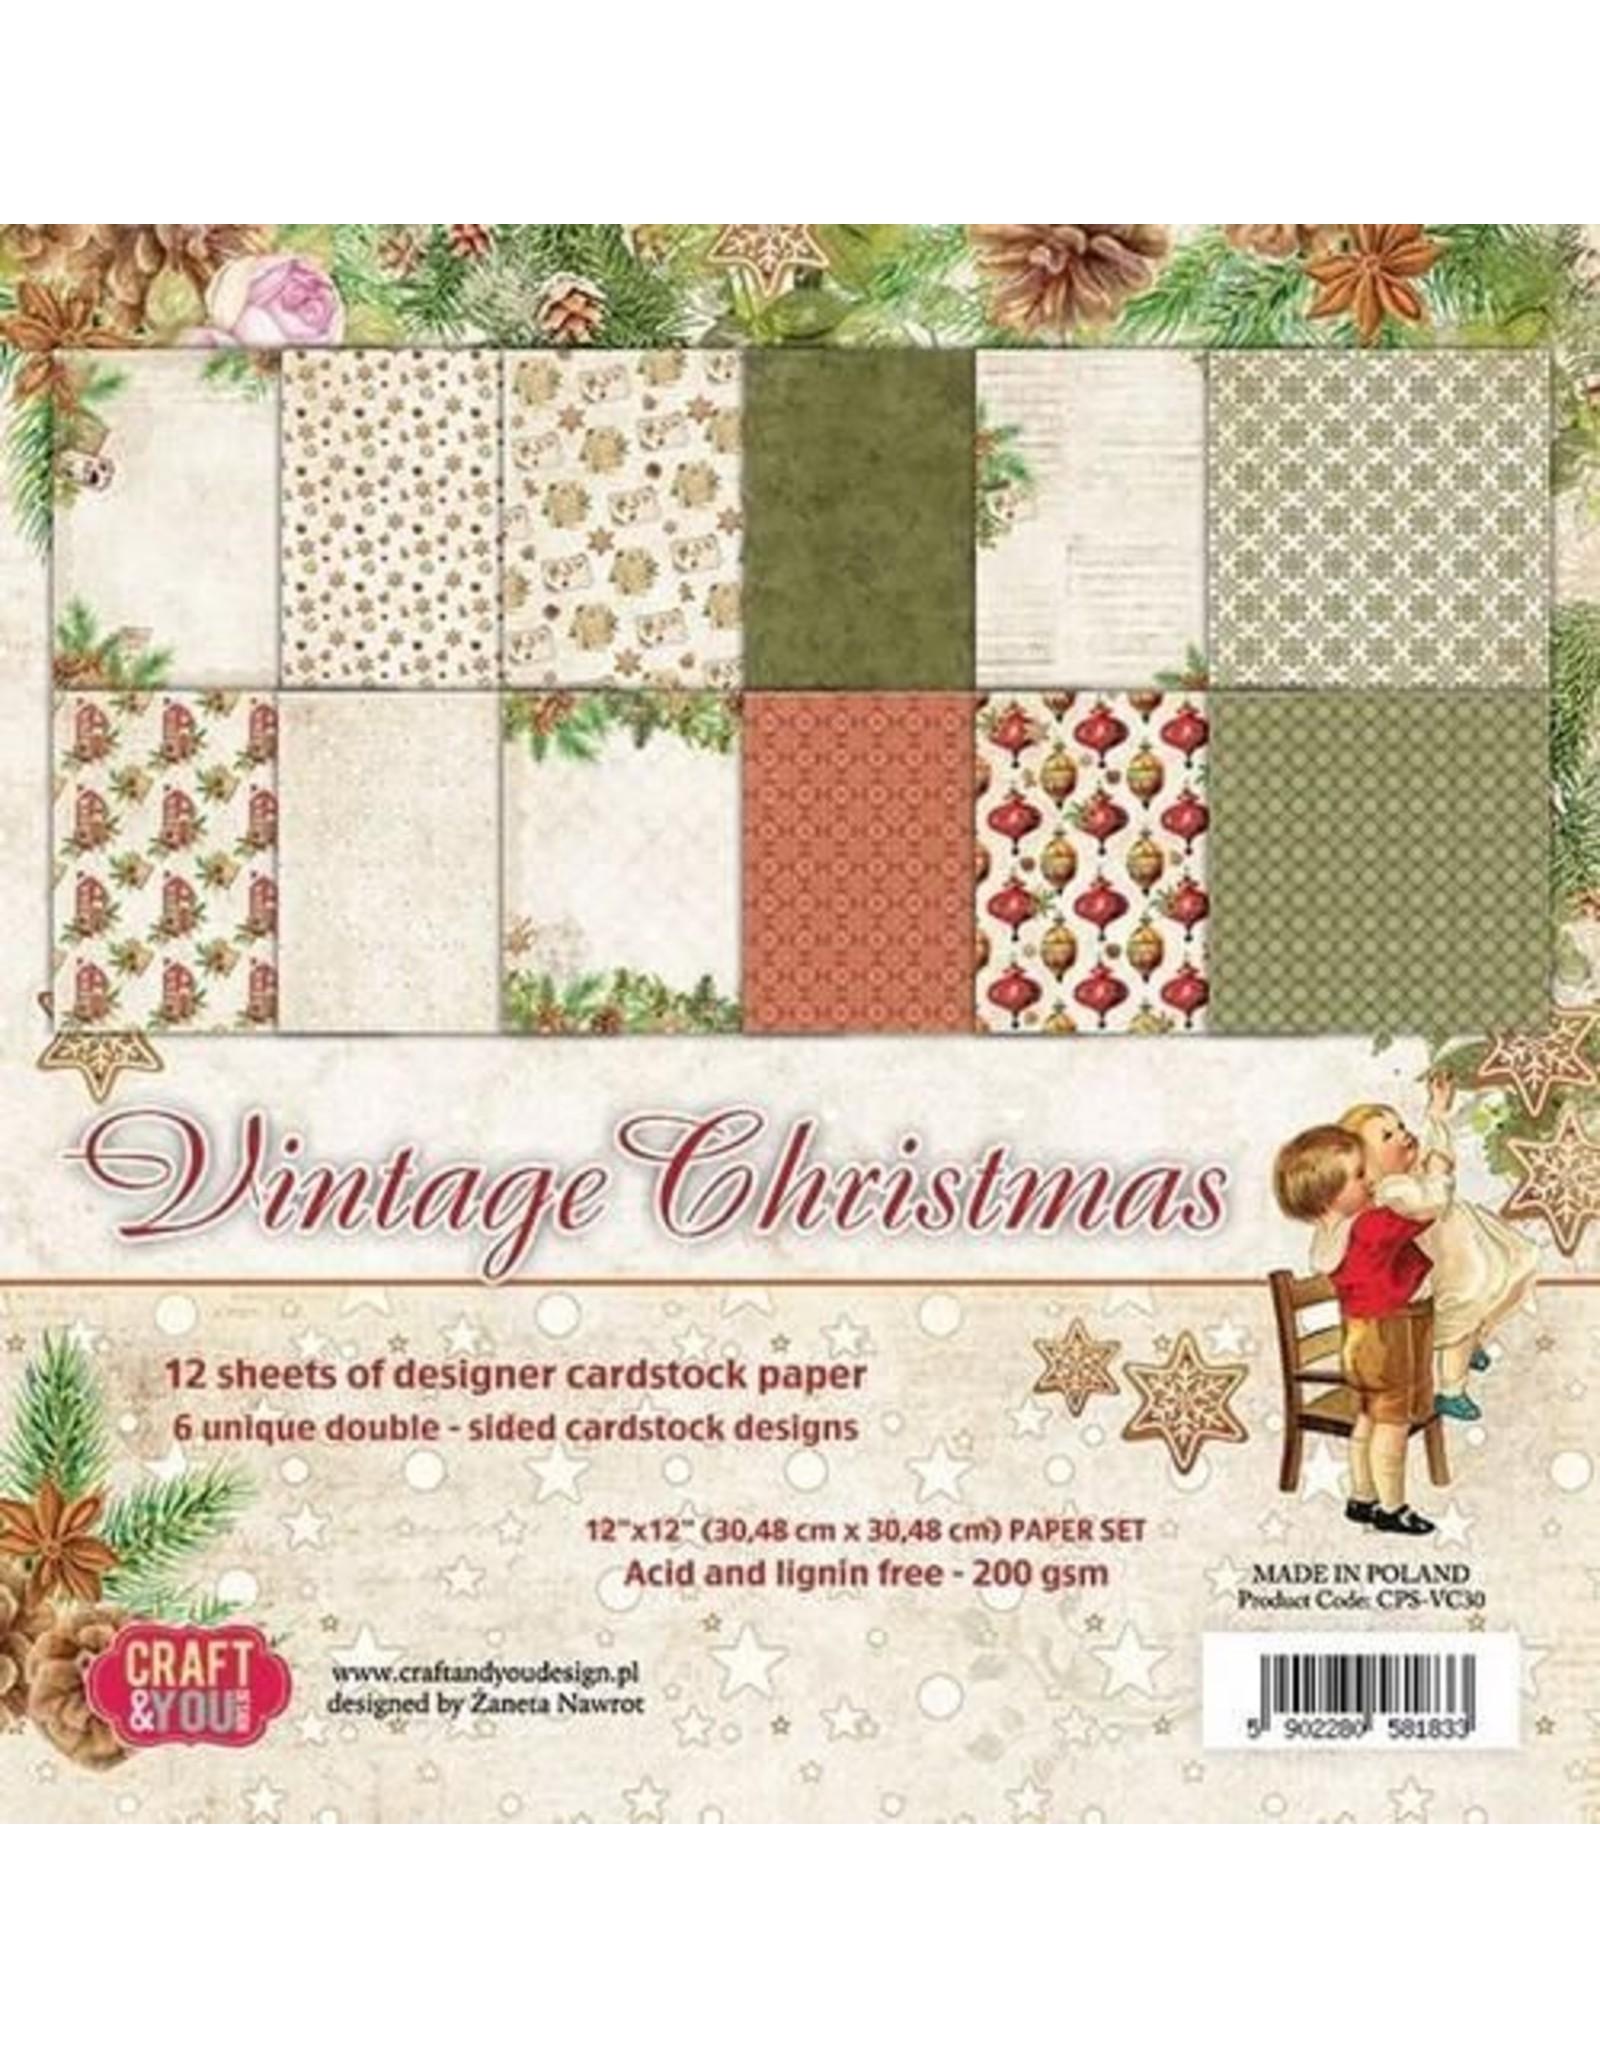 Craft&You Vintage Christmas Big Paper Set 12x12 12 vel CPS-VC30 (09-18)